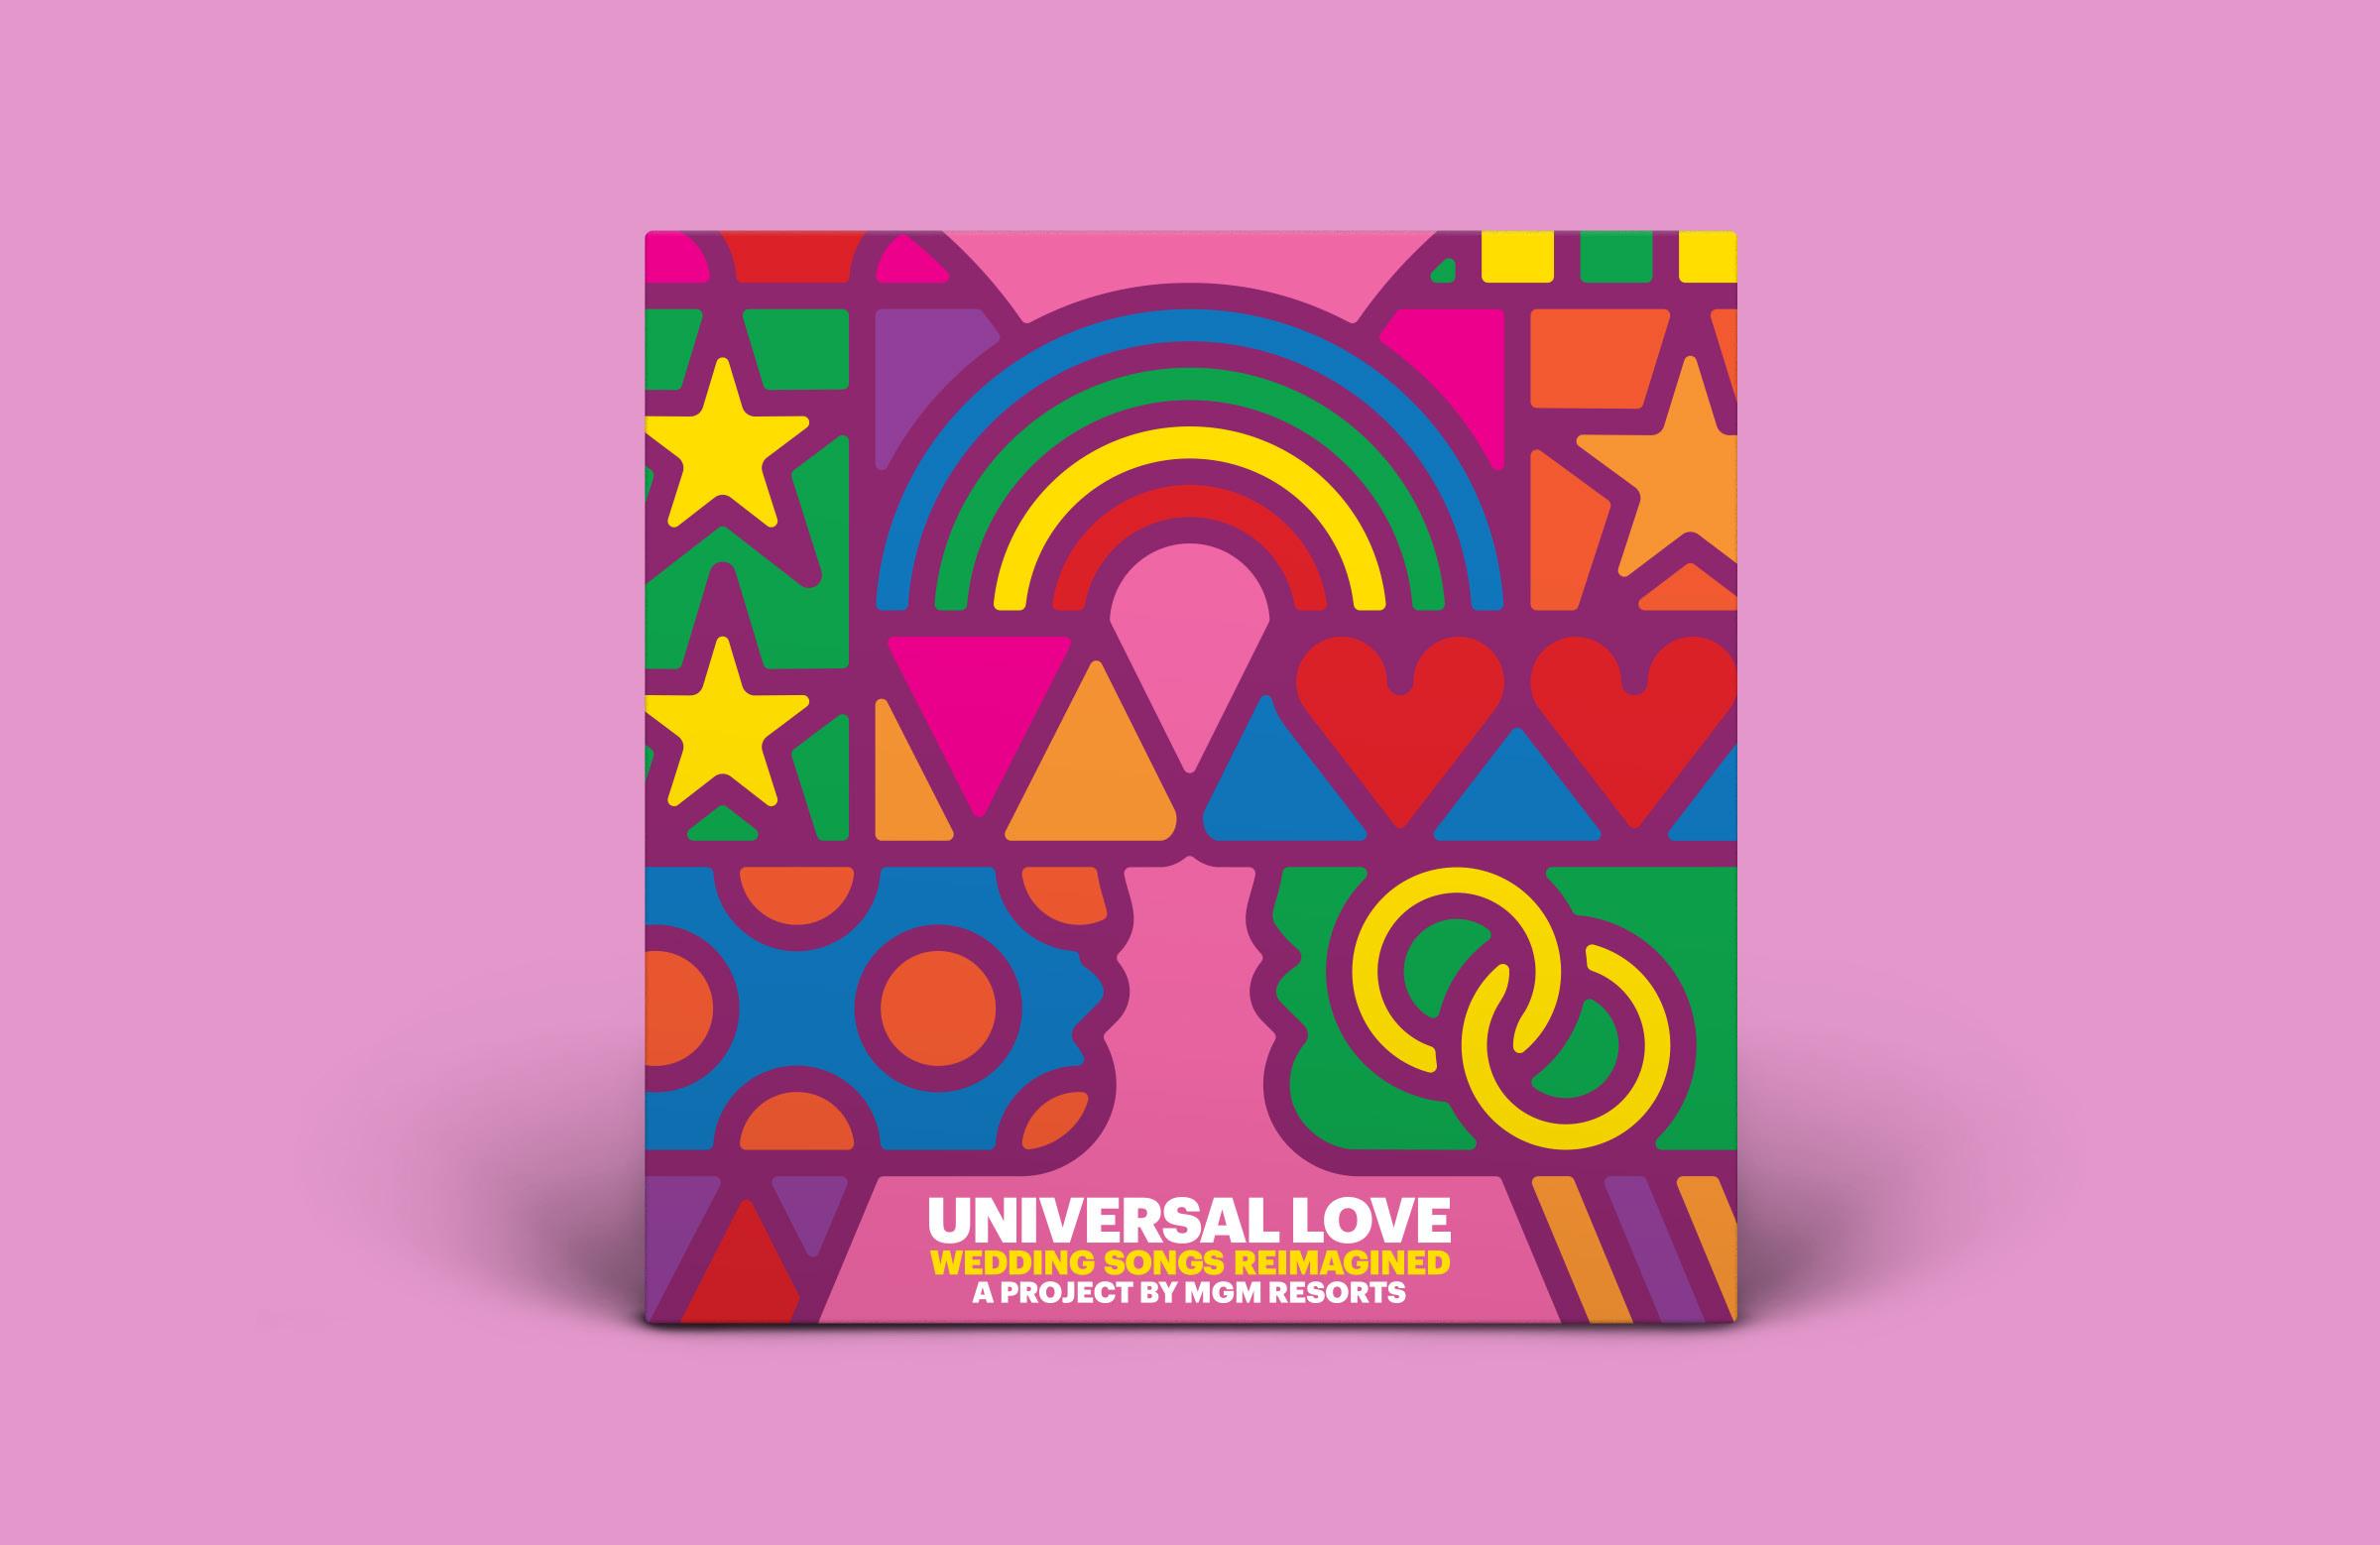 Album of Reimagined Love Songs Features Artistic Vision of Bob Dylan, Kesha, Benjamin Gibbard, St. Vincent, Valerie June and Kele Okereke